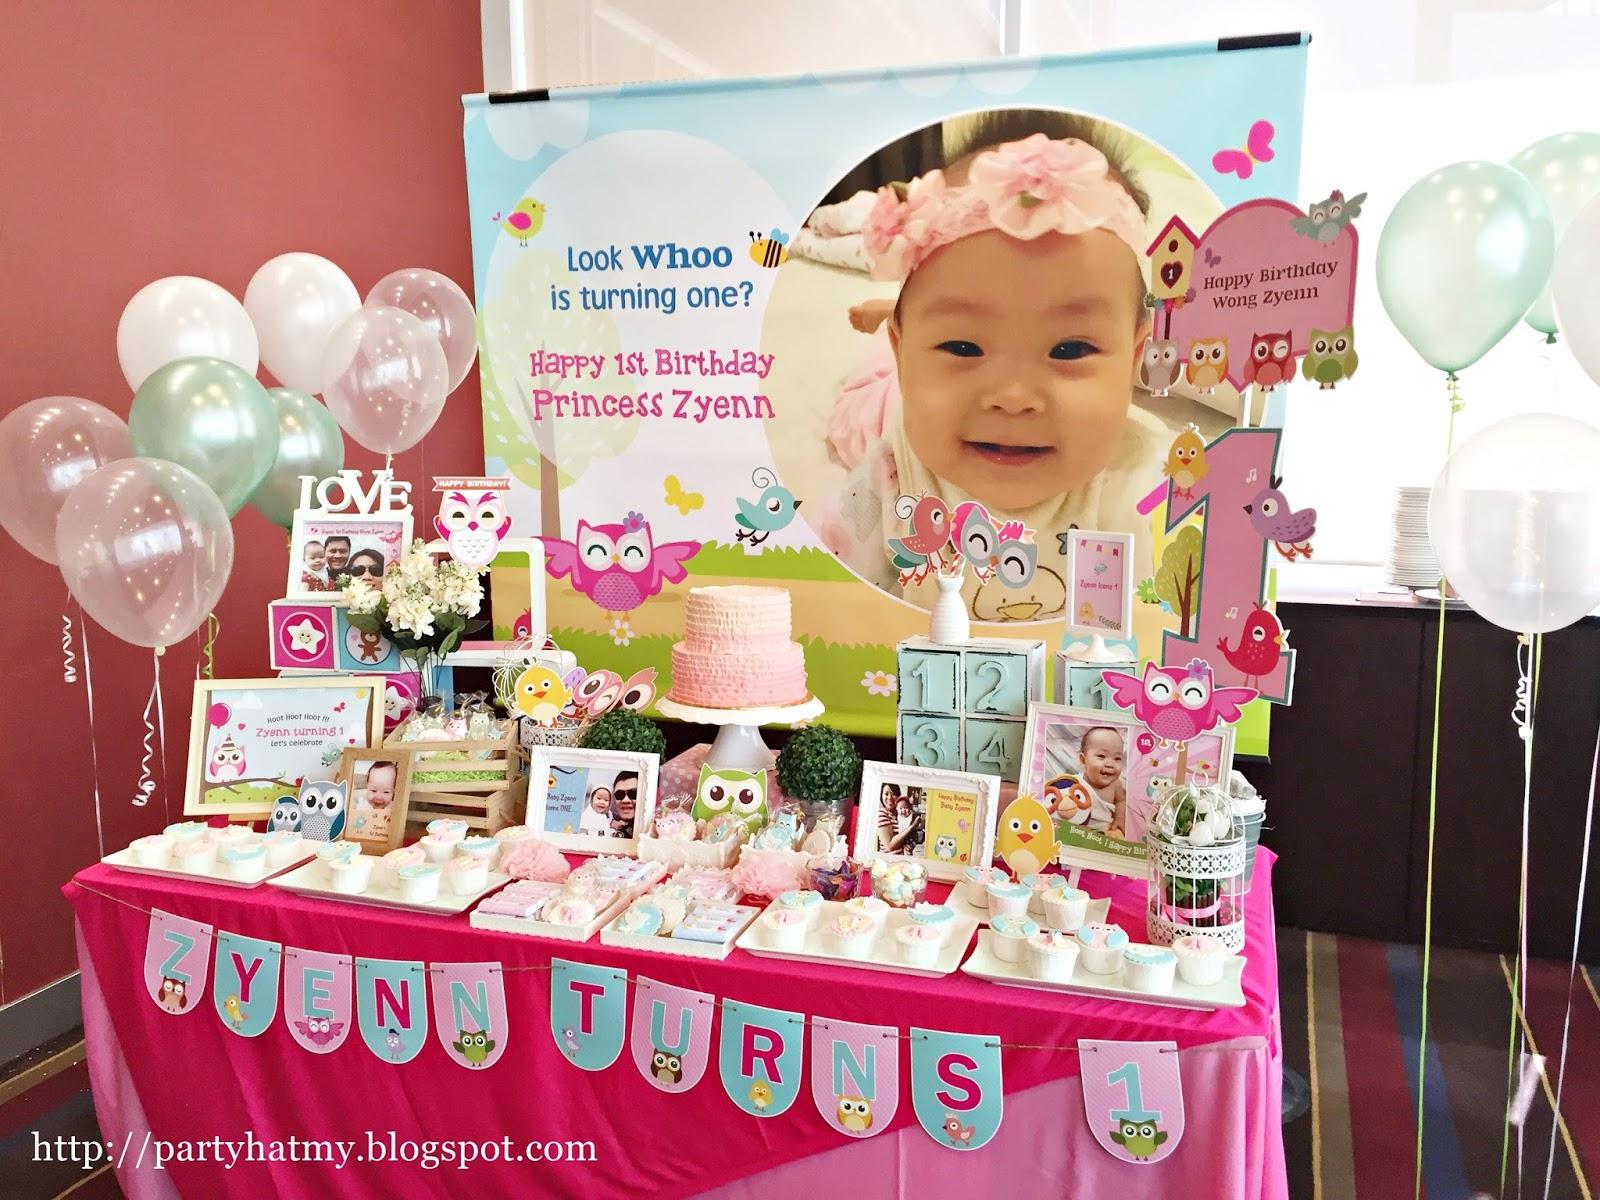 Party Hat Princess Zyenn 1 Year Old Owl Birthday